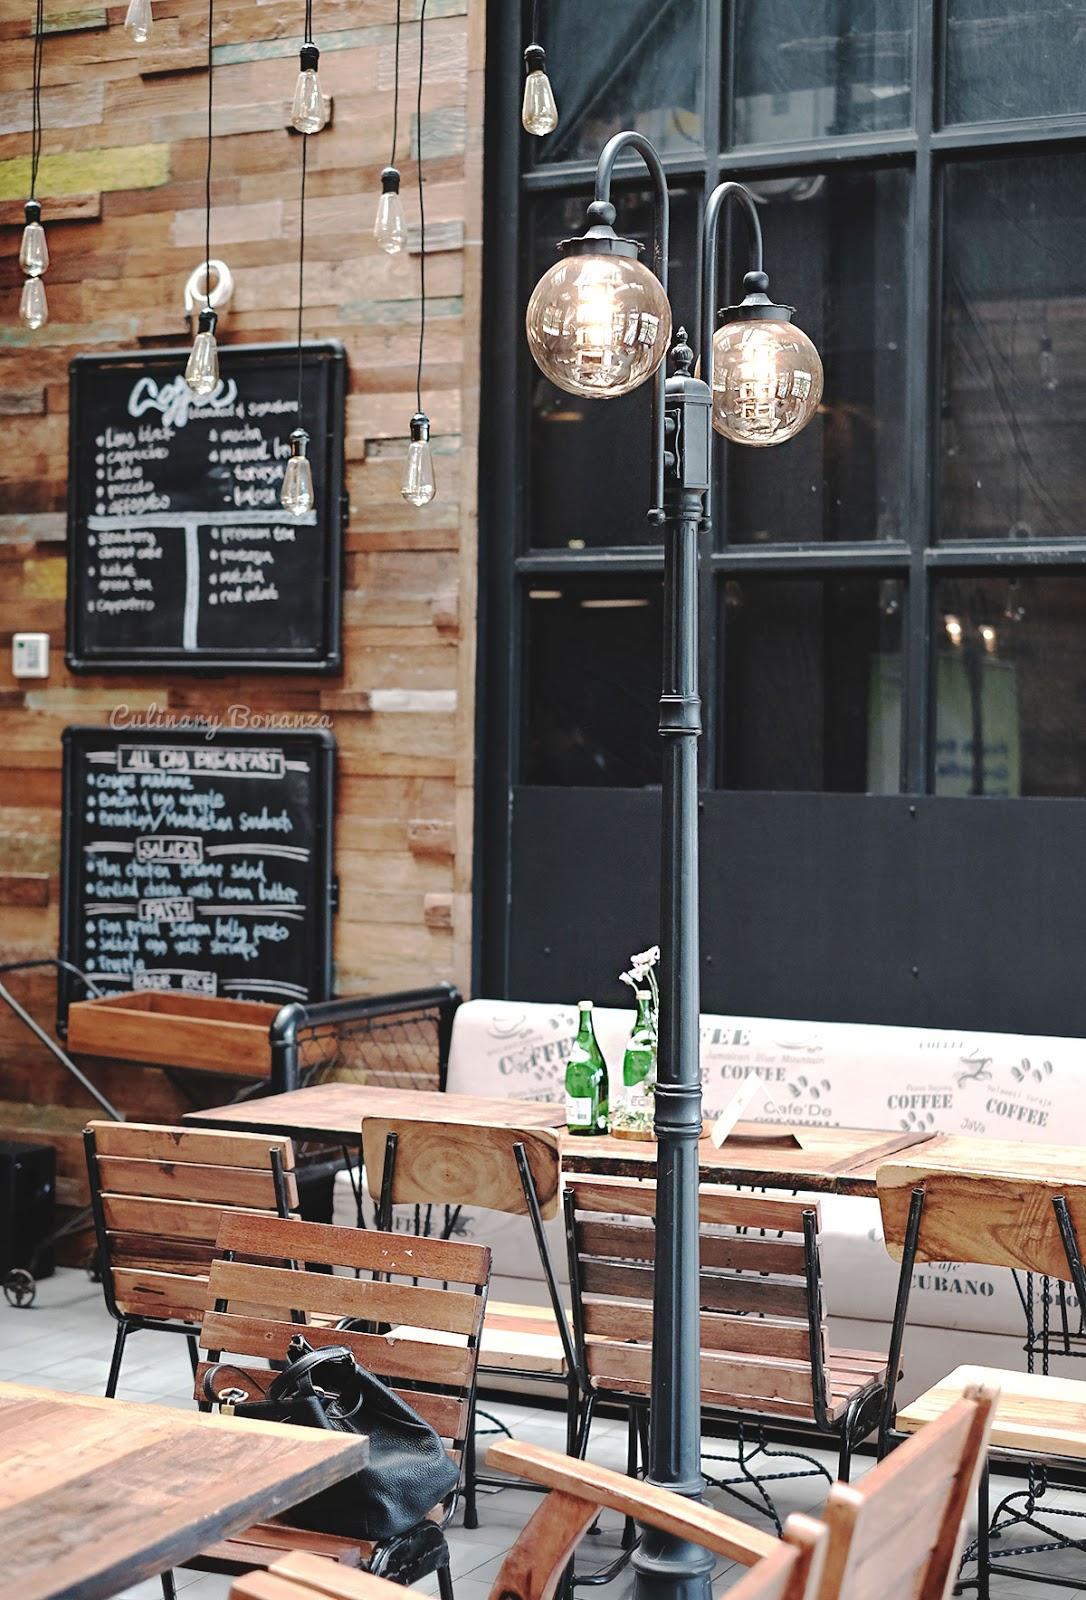 Coffee-Kulture-Jakarta-(www.culinarybonanza.com)